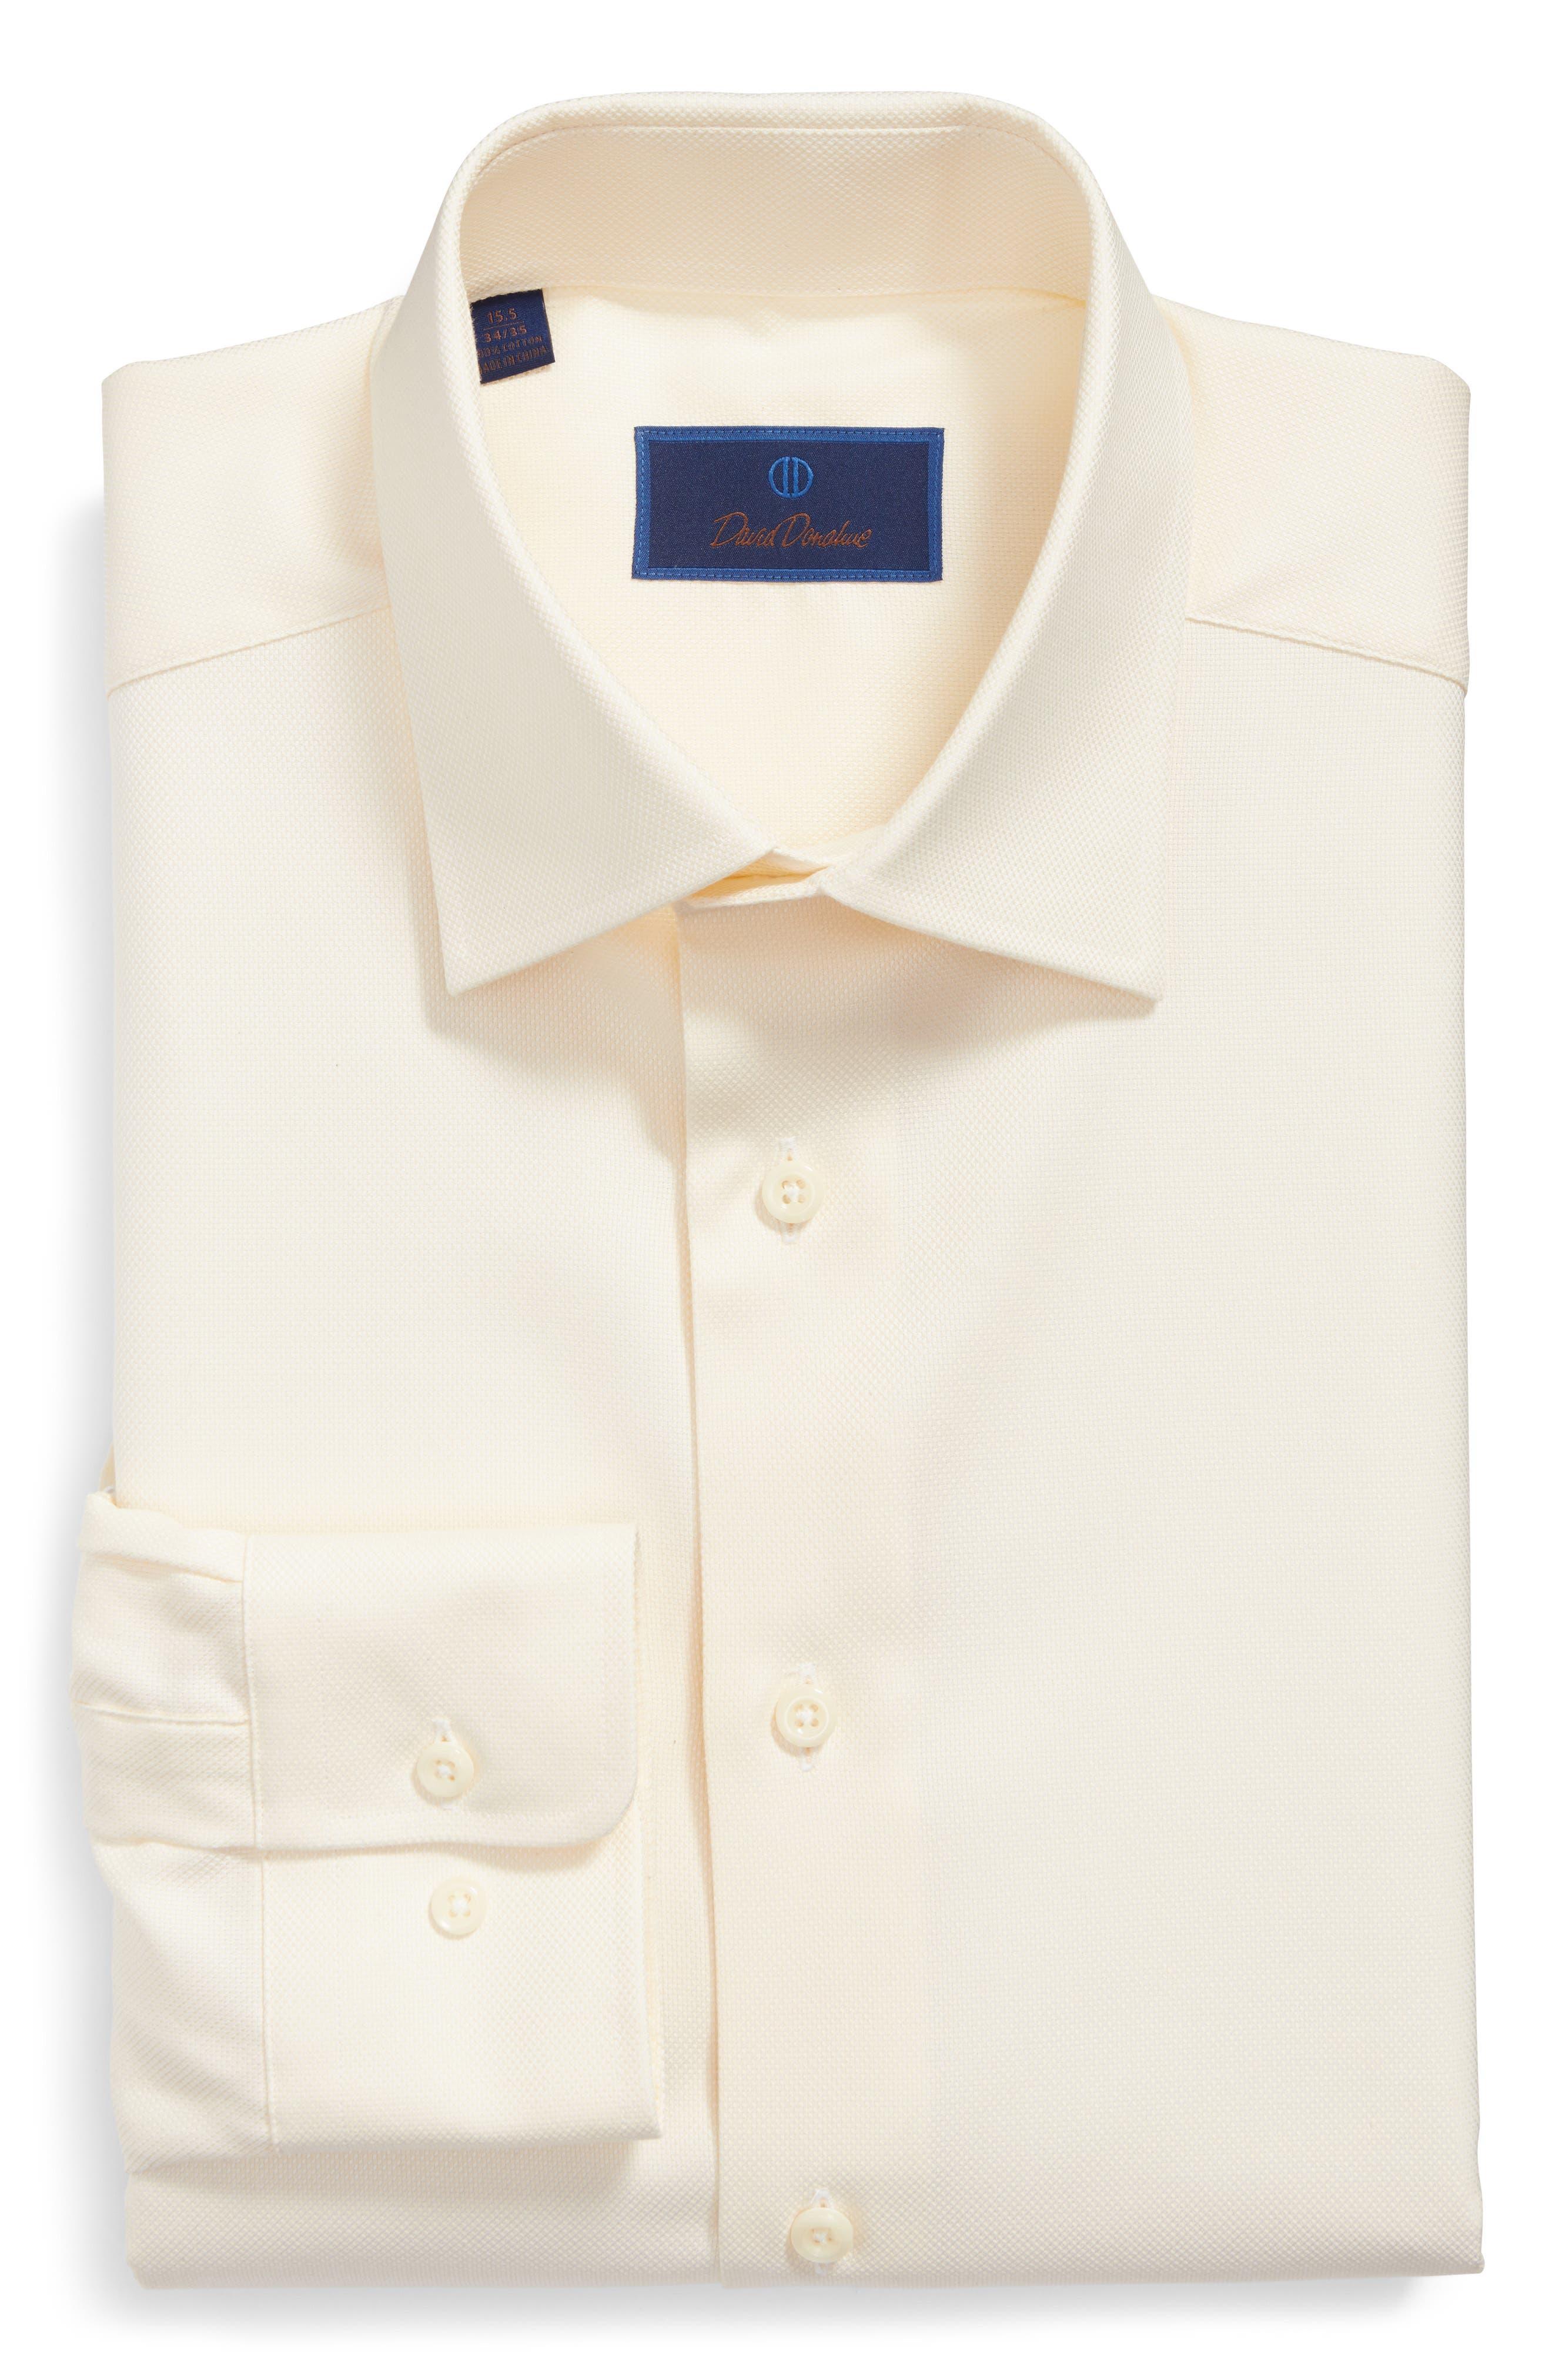 Regular Fit Oxford Dress Shirt,                             Alternate thumbnail 2, color,                             ECRU